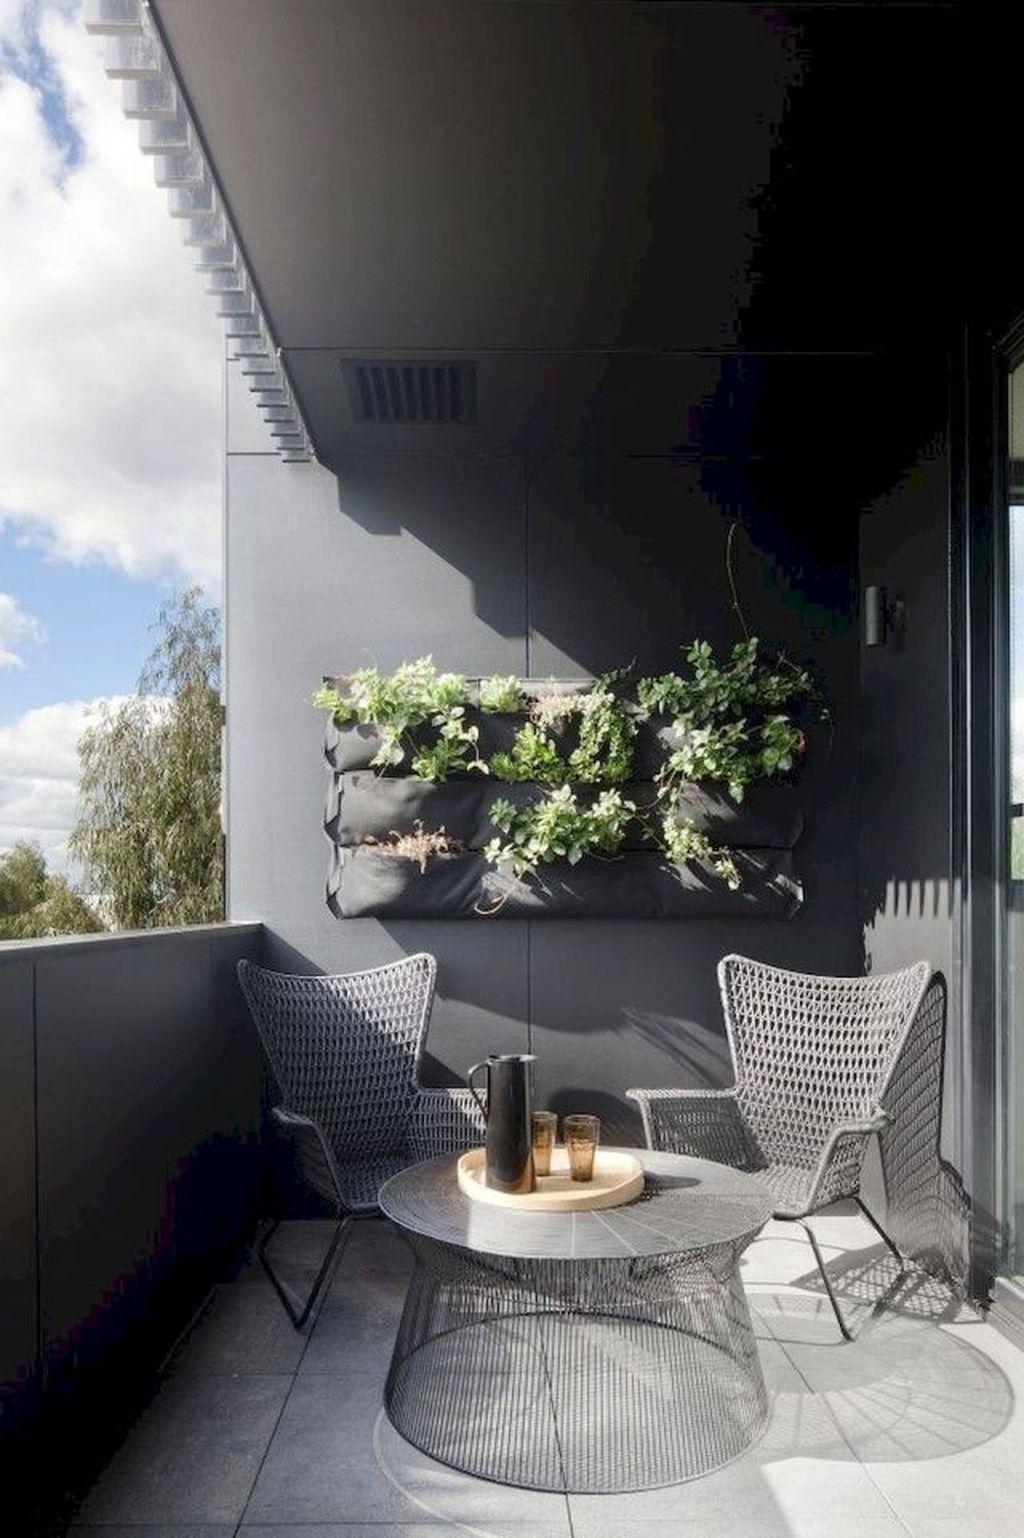 40 Chic Apartment Small Balcony Design Ideas For You Small Balcony Design Balcony Design Modern Balcony Furniture